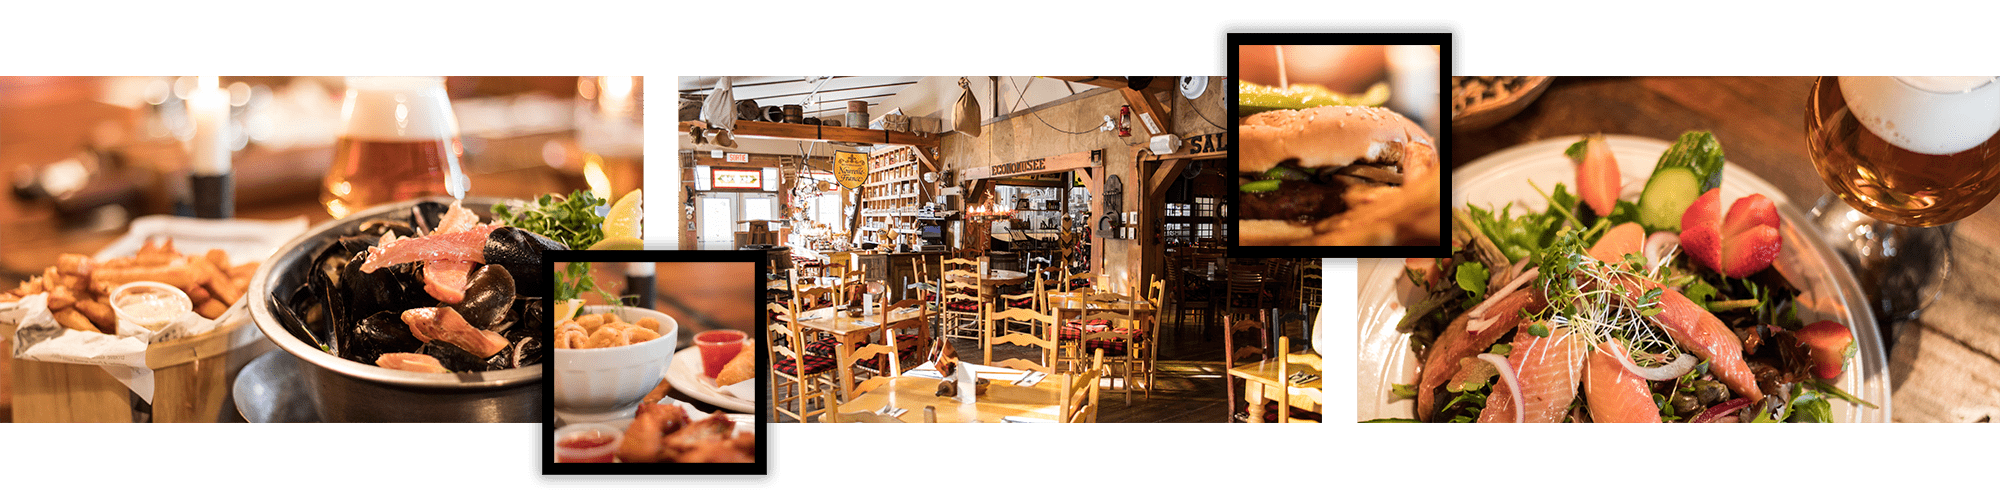 Restaurant Nouvelle France